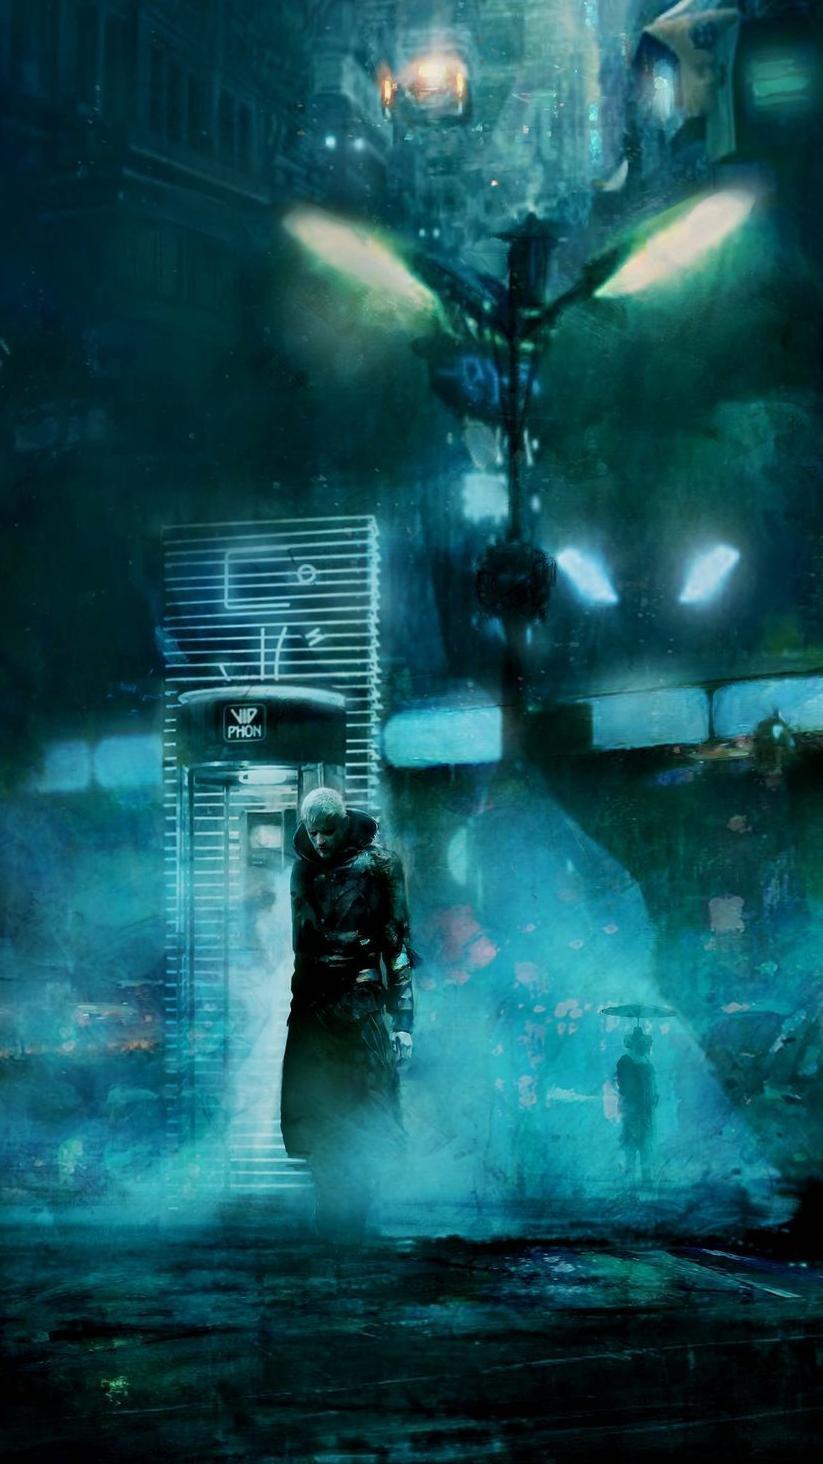 Blade Runner Phone Wallpapers - Wallpaper Cave